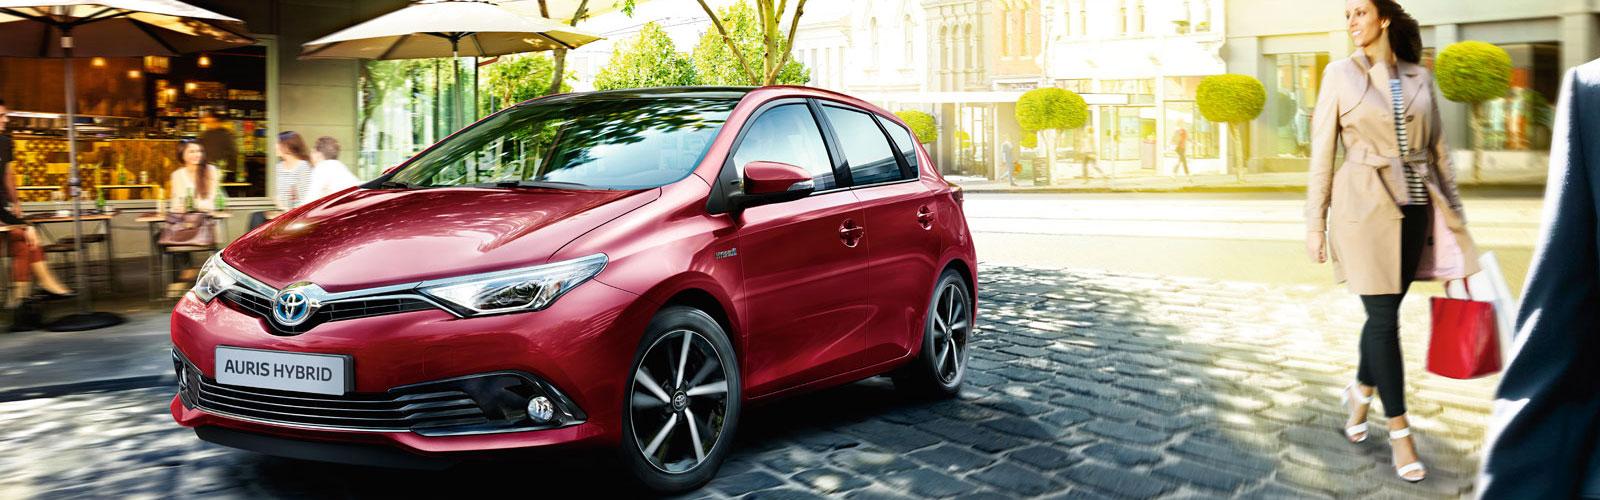 Toyota Auris en color rojo